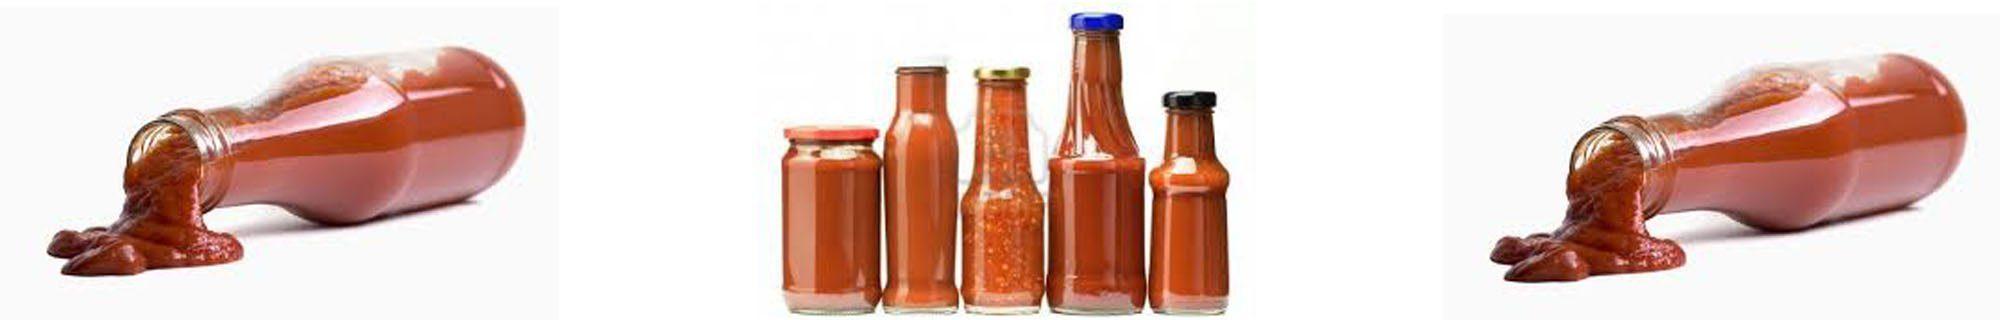 Ketchup selbst zubereiten